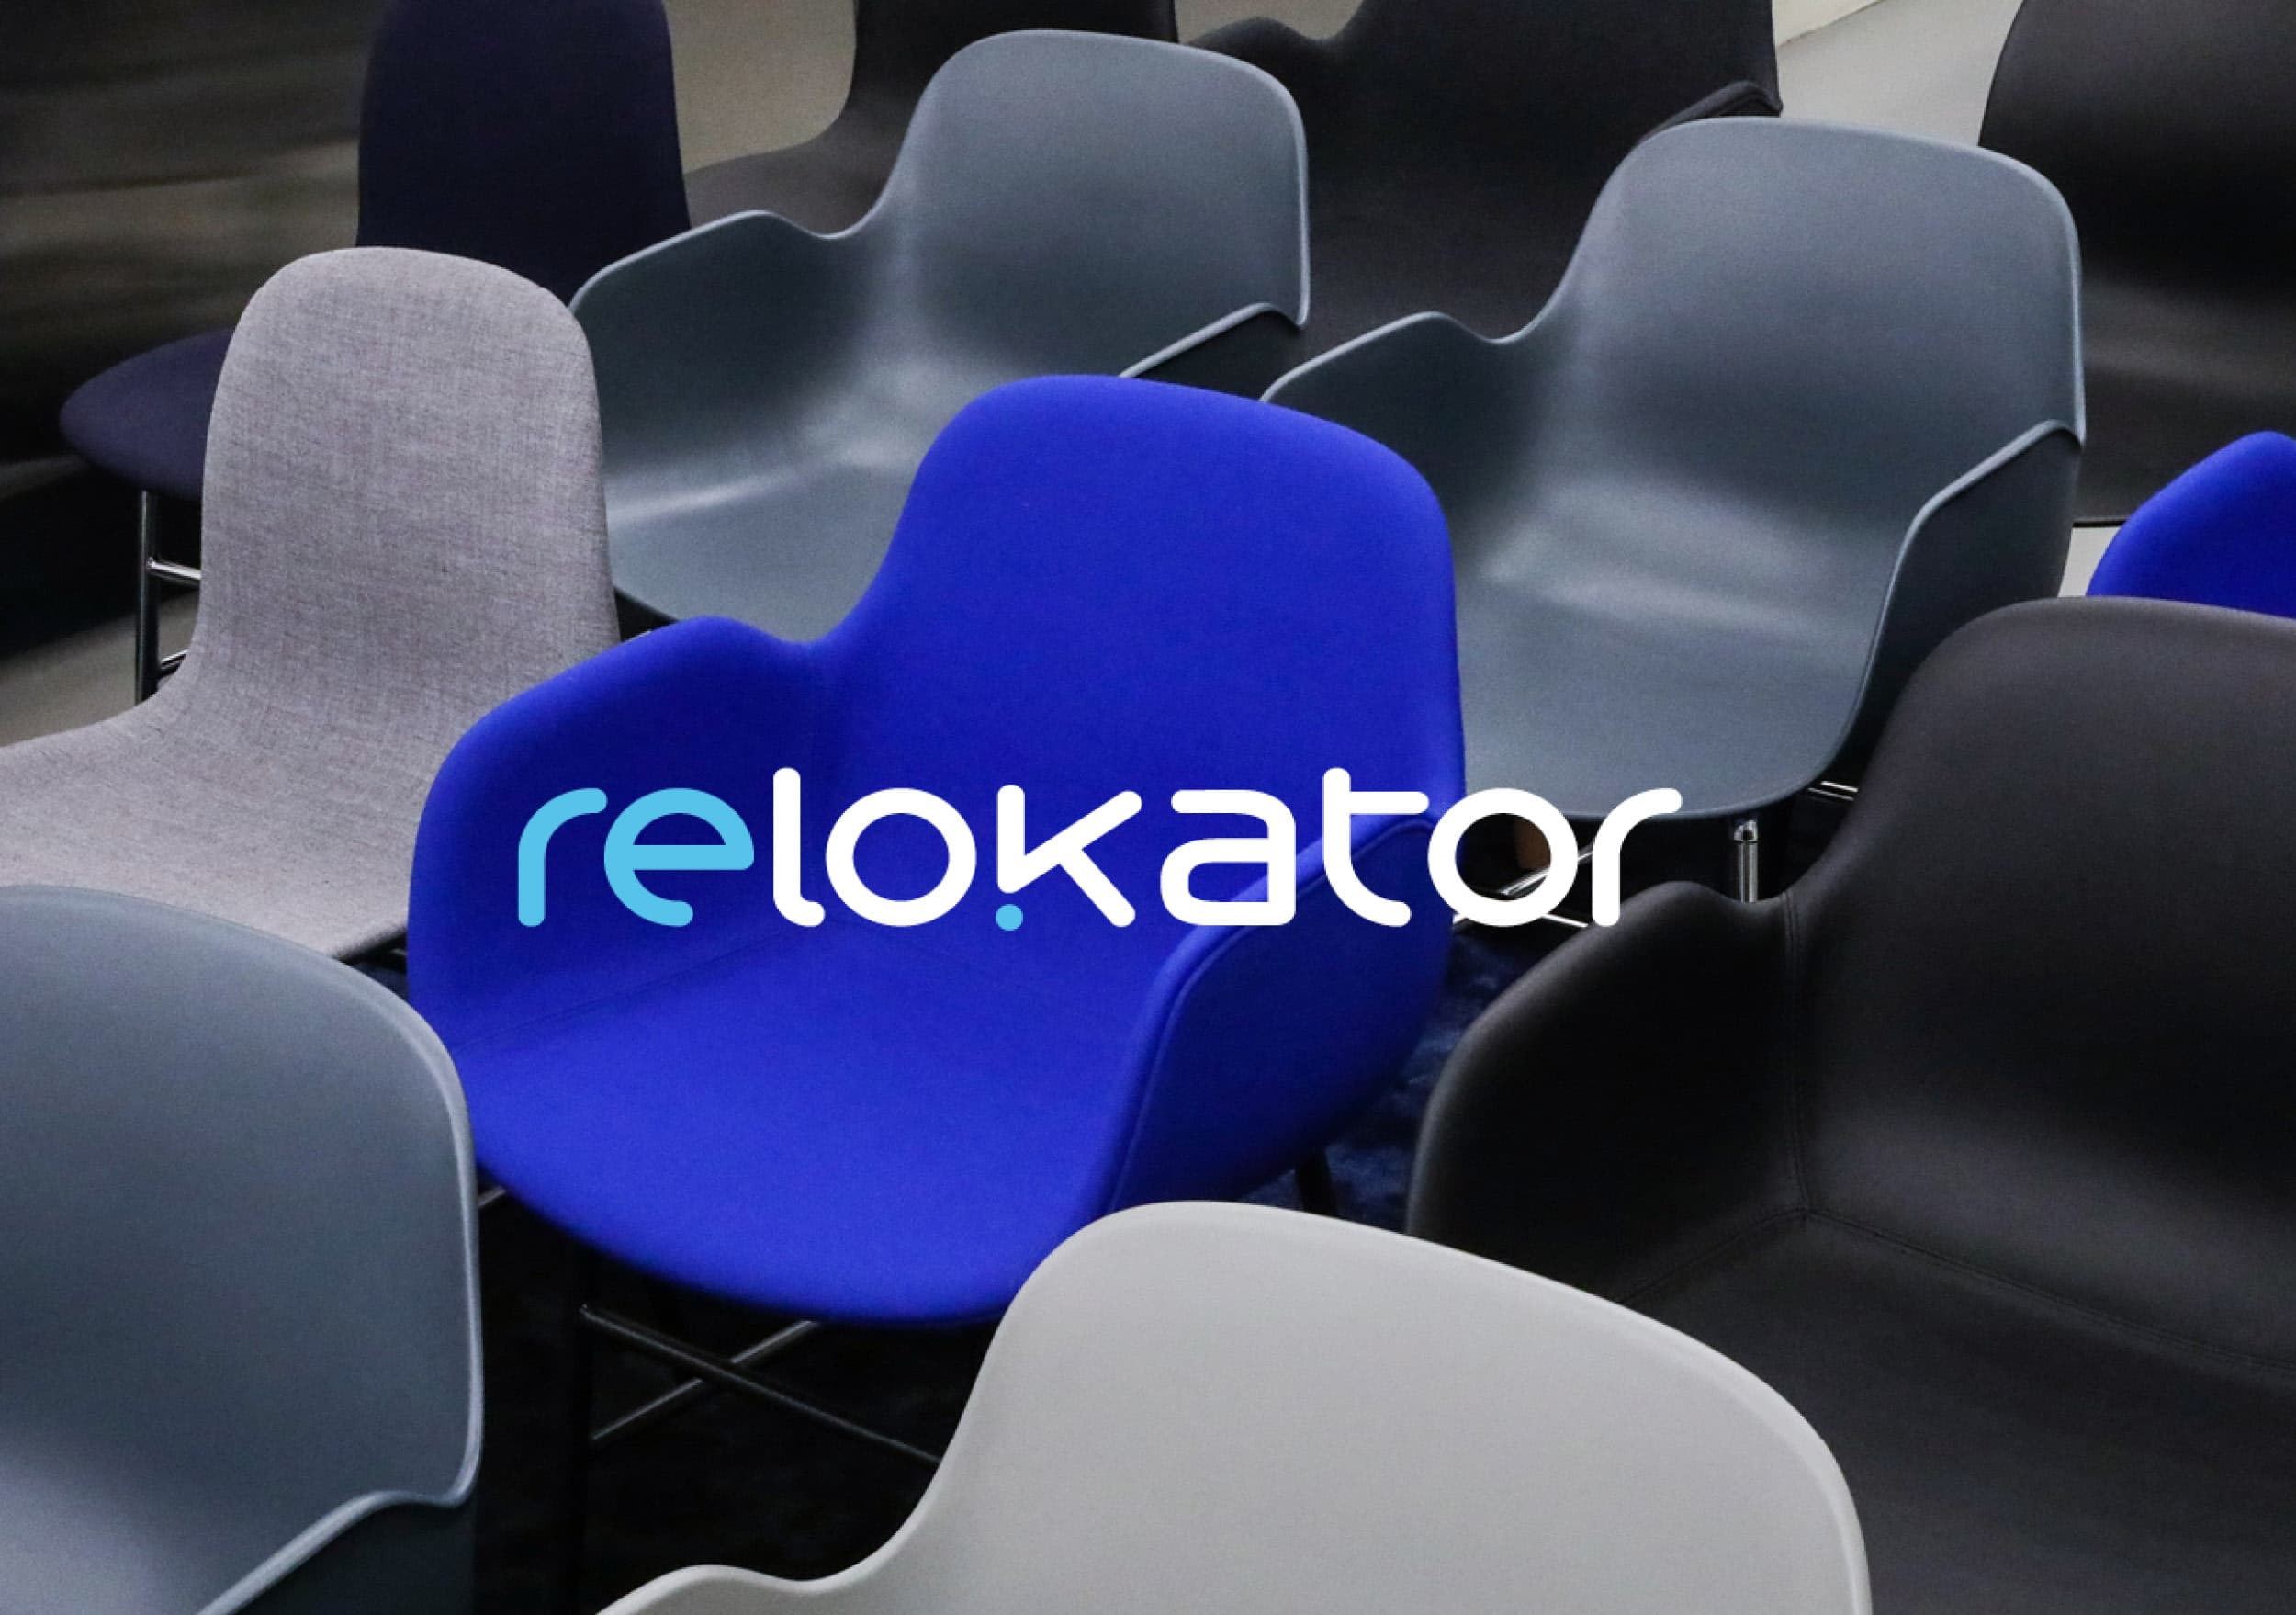 Relokator